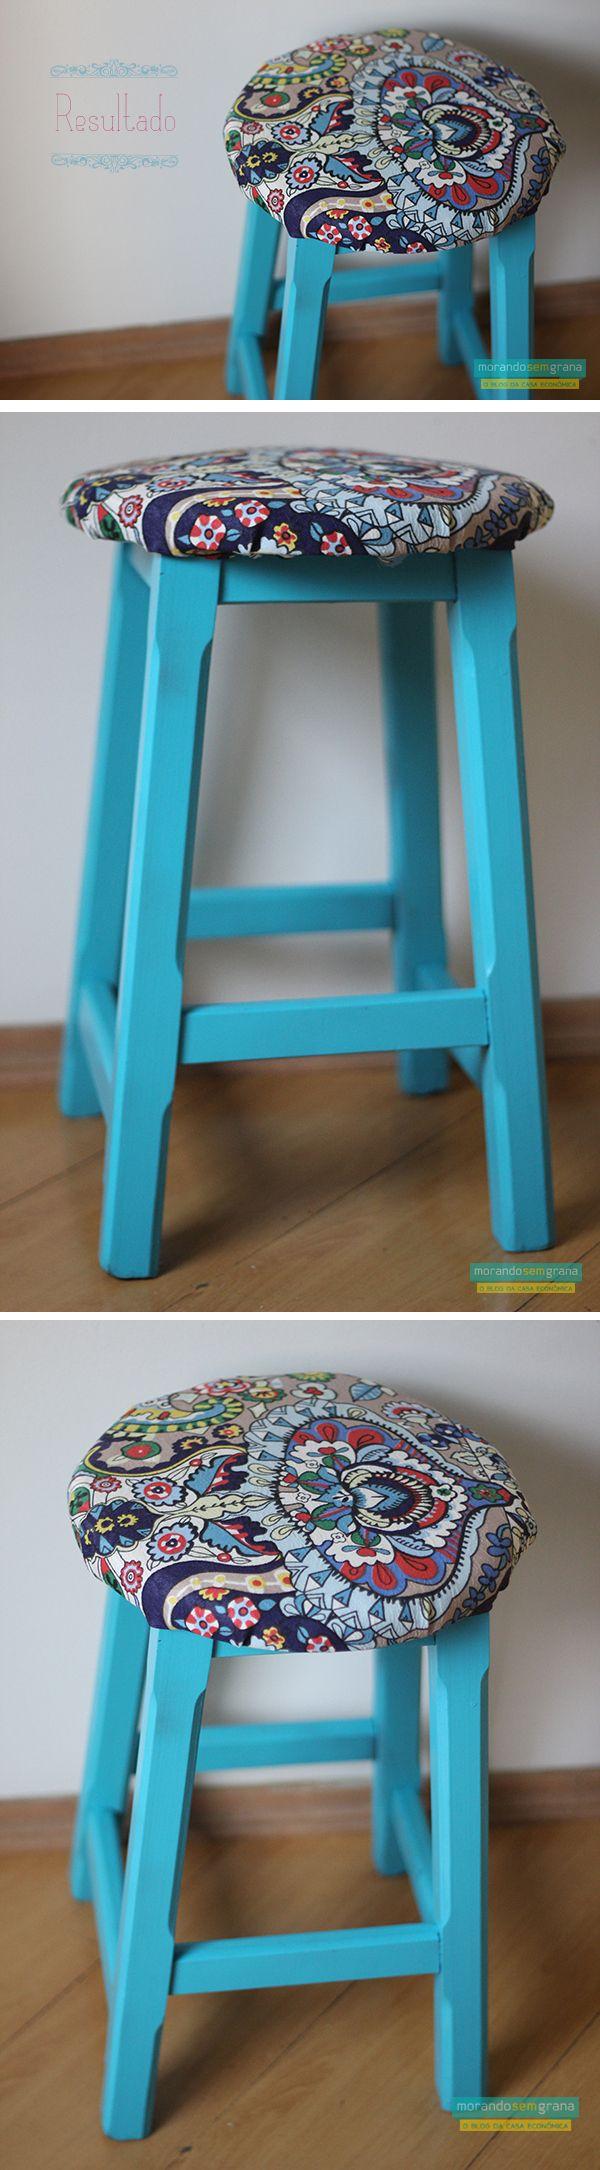 como-pintar-banquinho-de-madeira-tutorial-faca-voce-mesmo-diy-estofando-banco-materiais-spray-azul-tiffany-onde-encontrar-karsten-decor-grampeador-de-tapeceiro (12)